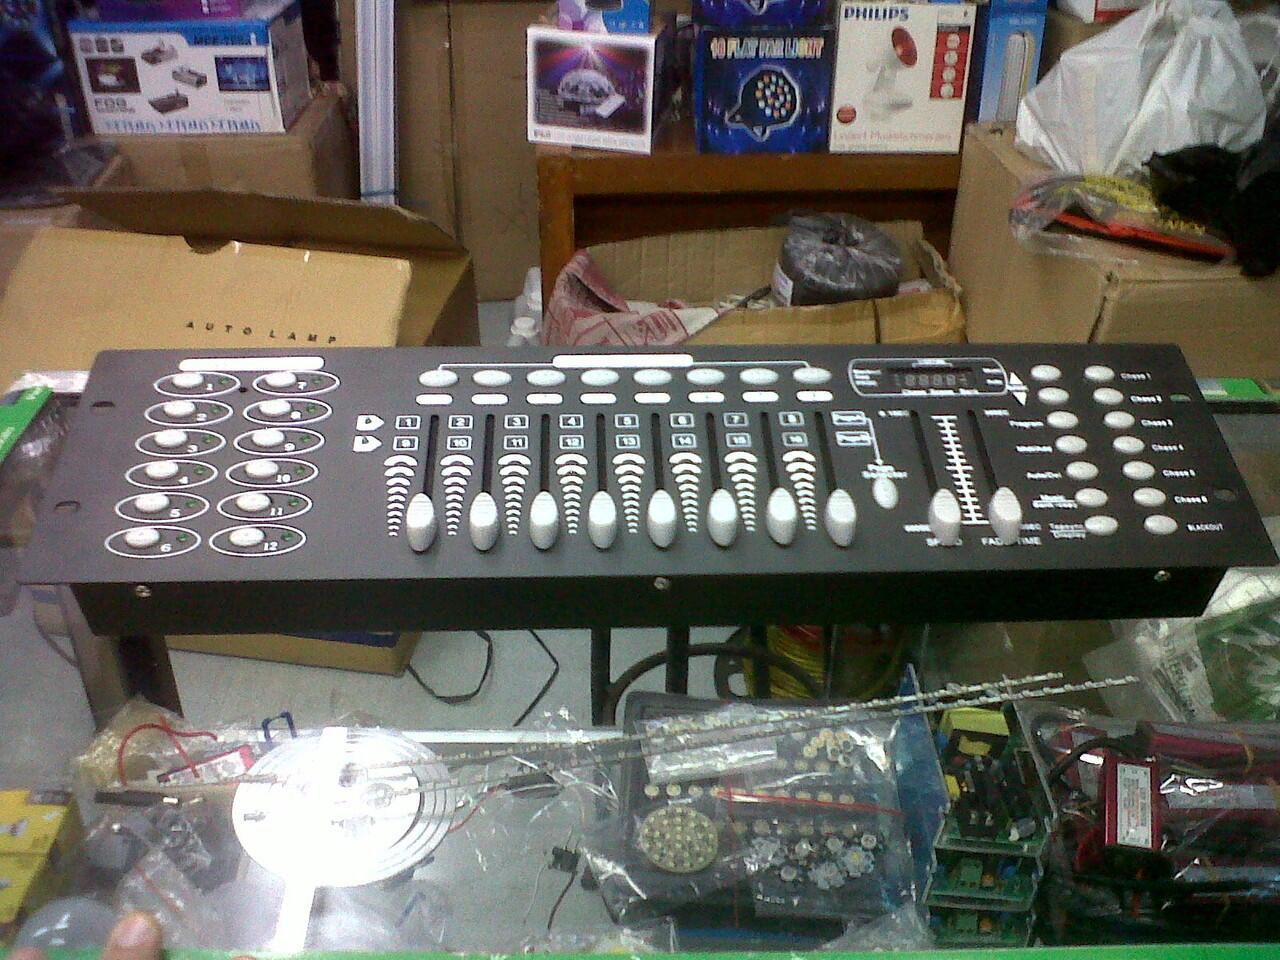 [IMAGINATION MUSIC STORE] Mixer Lighting DMX - 512